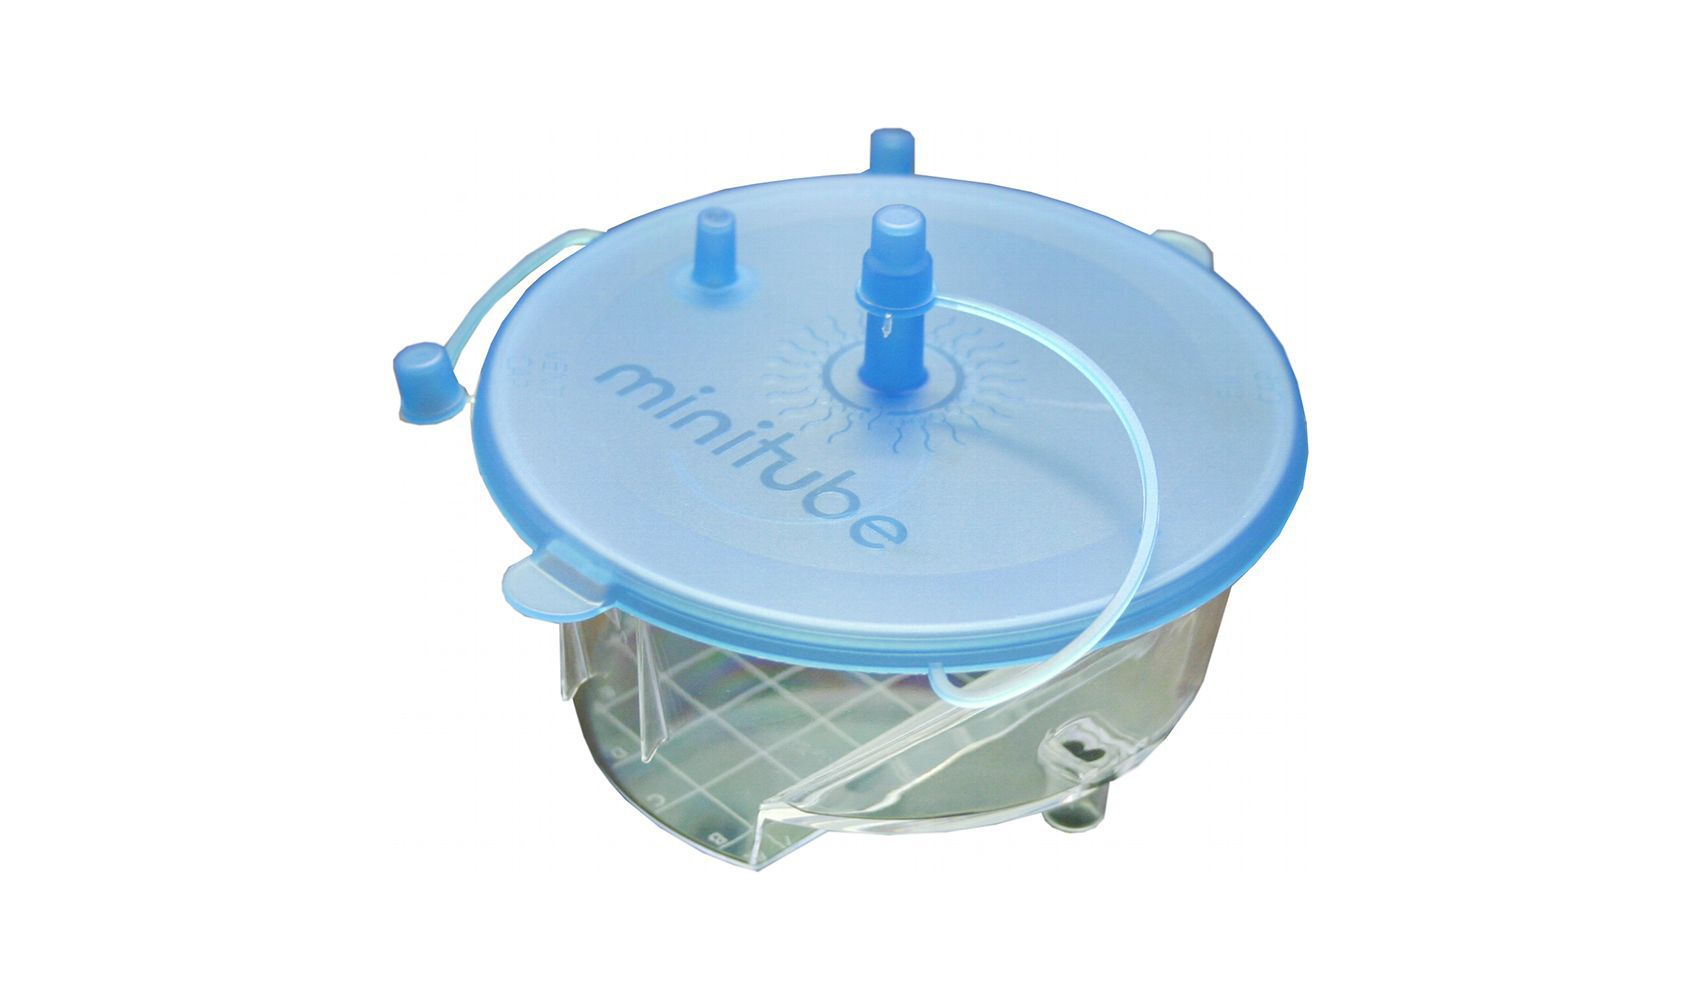 40005 mt emsafe filtersysteem voor embryos 1901060000